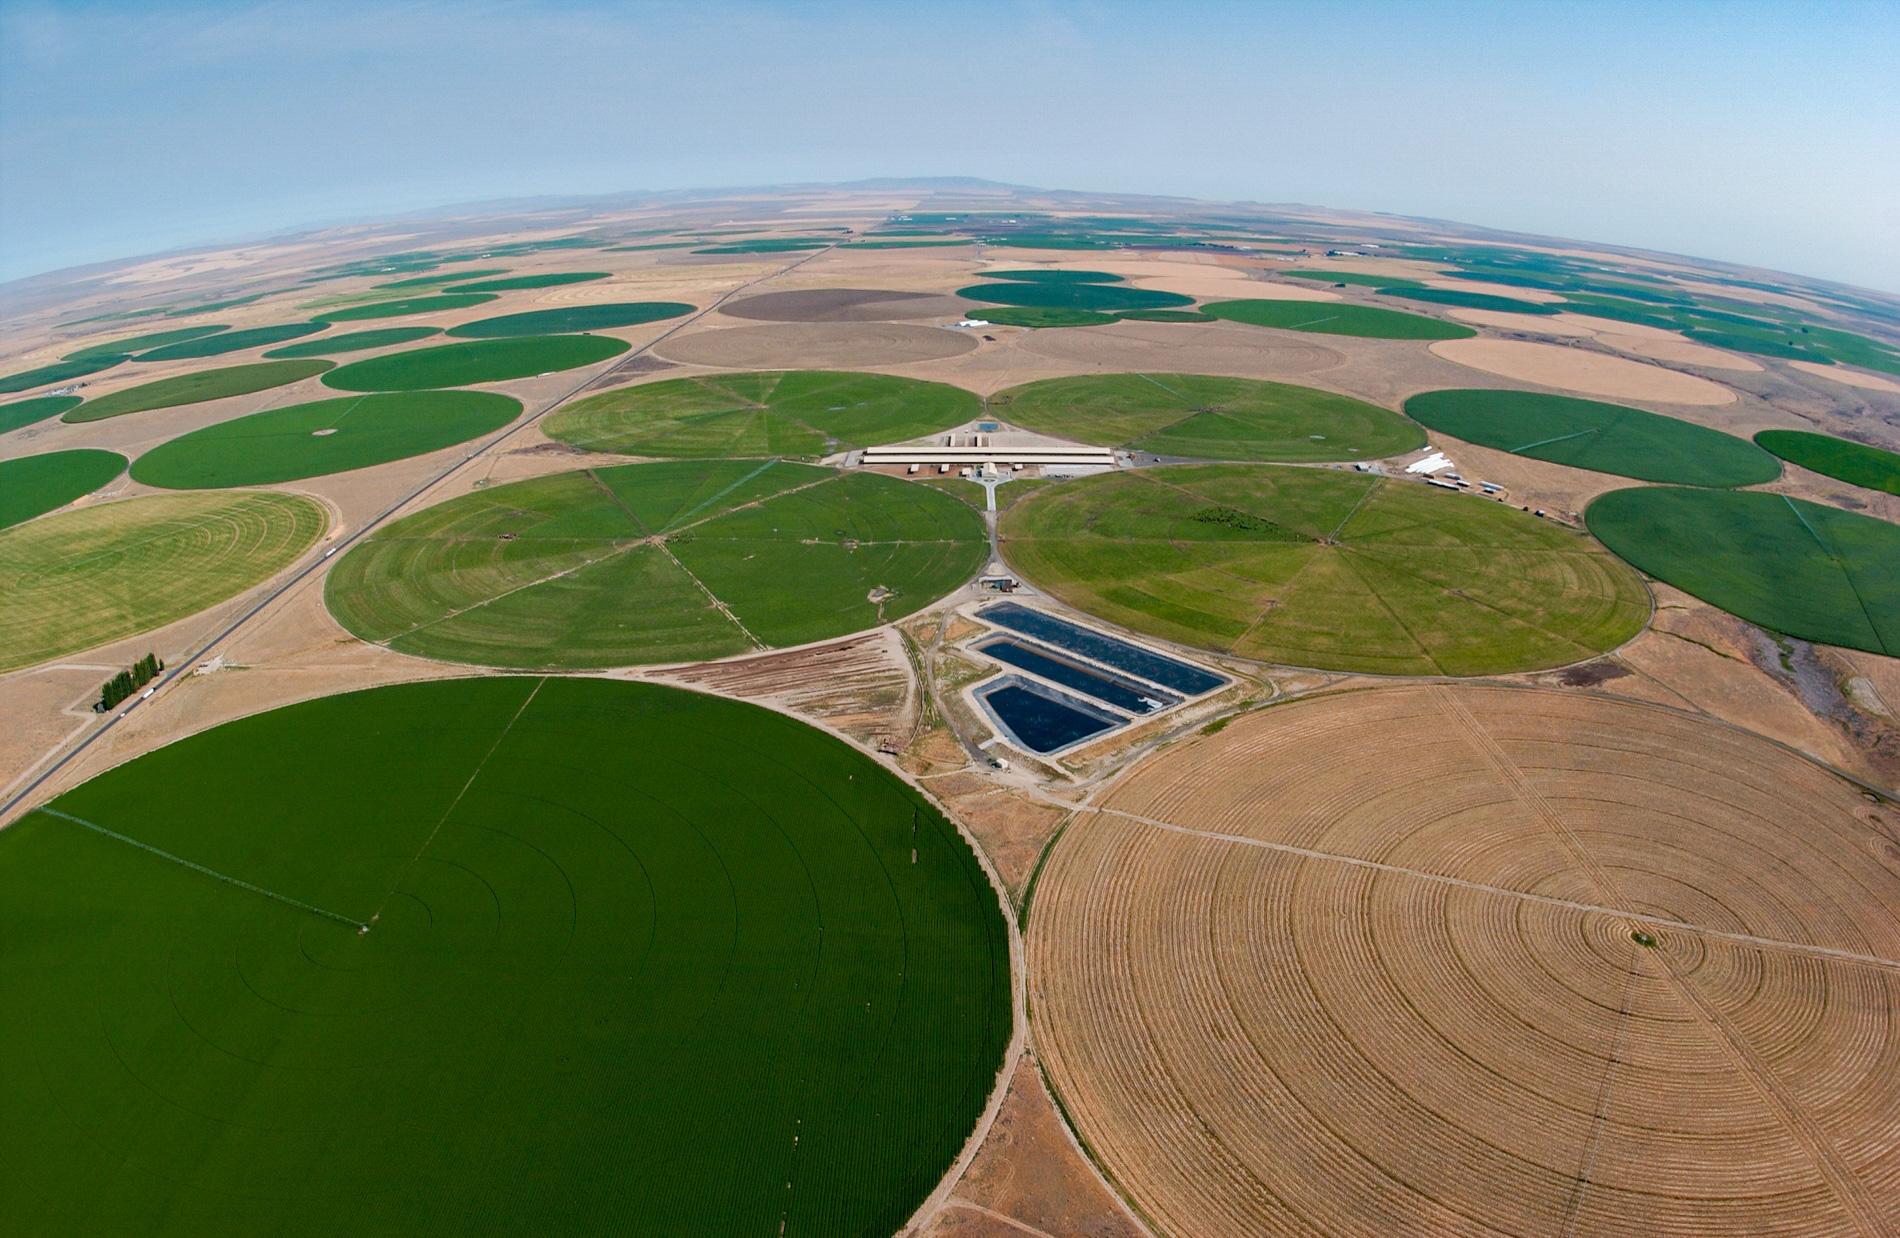 A Dairy in Between Crop Circles